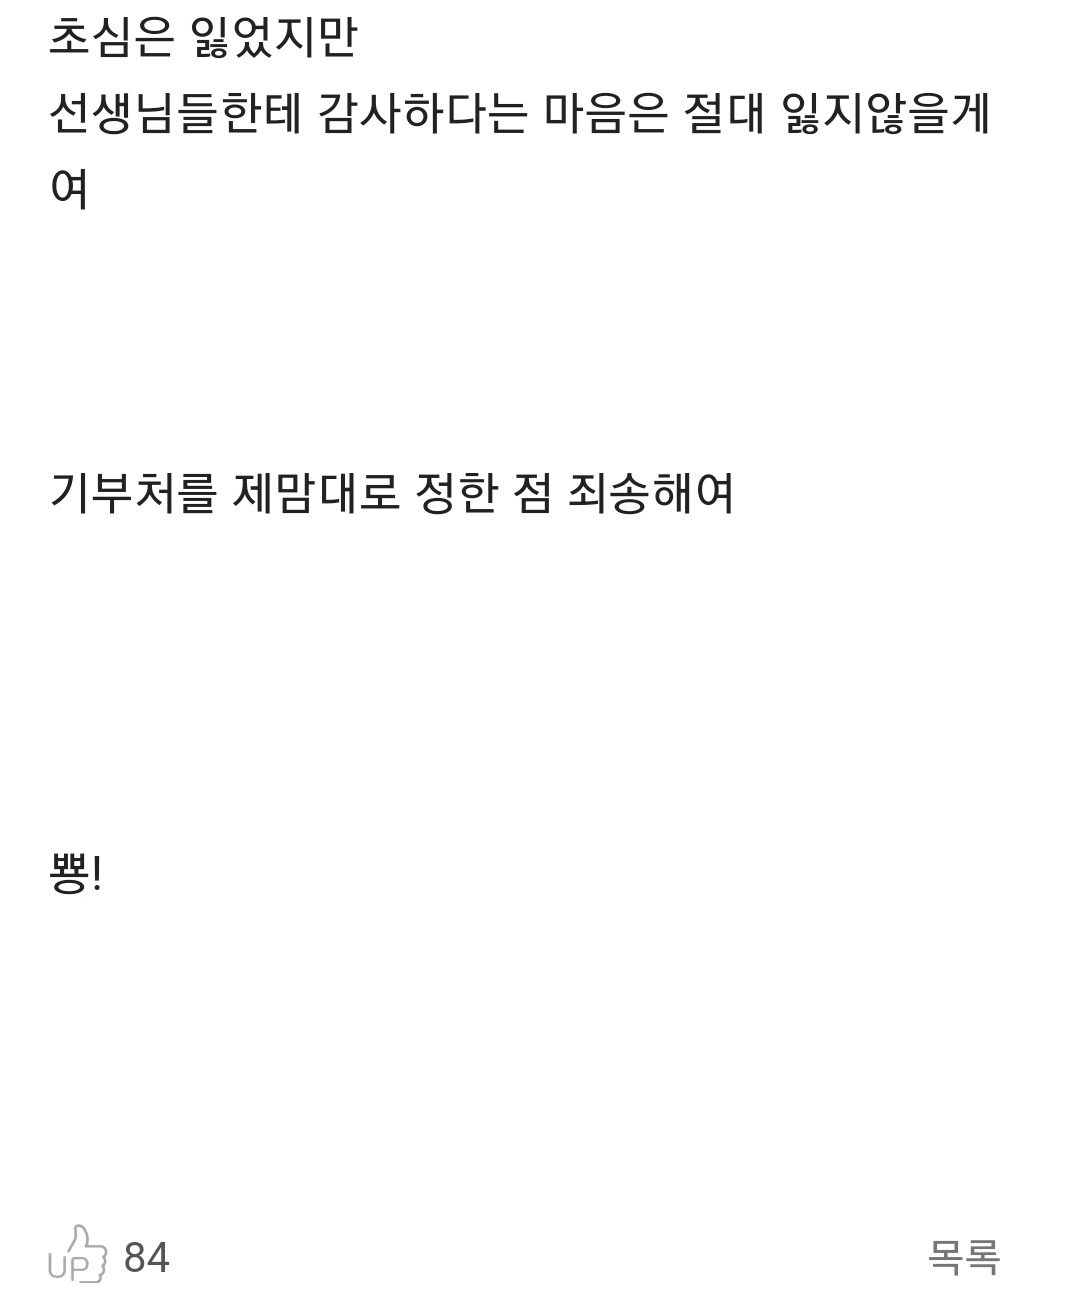 Screenshot_20210727-135743_AfreecaTV.jpg 천안함 재단에 1000만원 기부 인증한 BJ 덕자